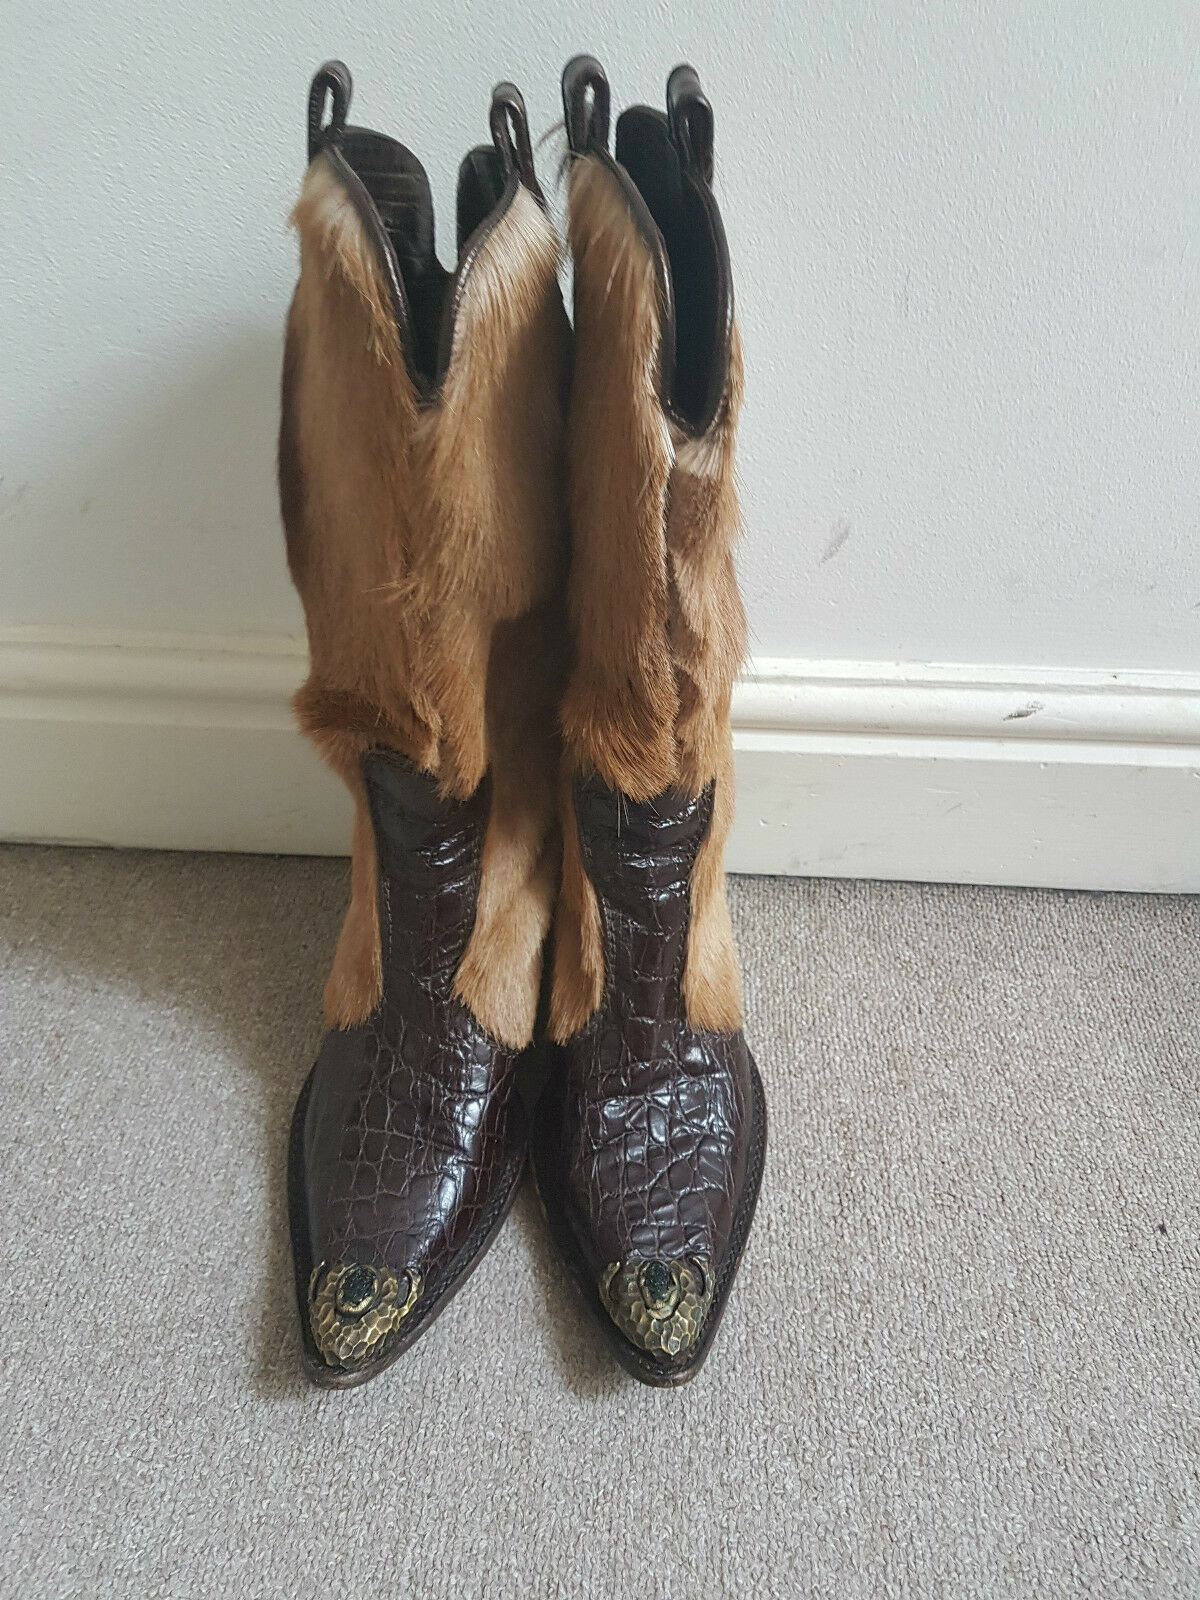 VERO CUOIO Italian Sneak Skin Leder Leder Skin  fur Cowboy Stiefel Schuhes Camel  Größe 37.5 04afda